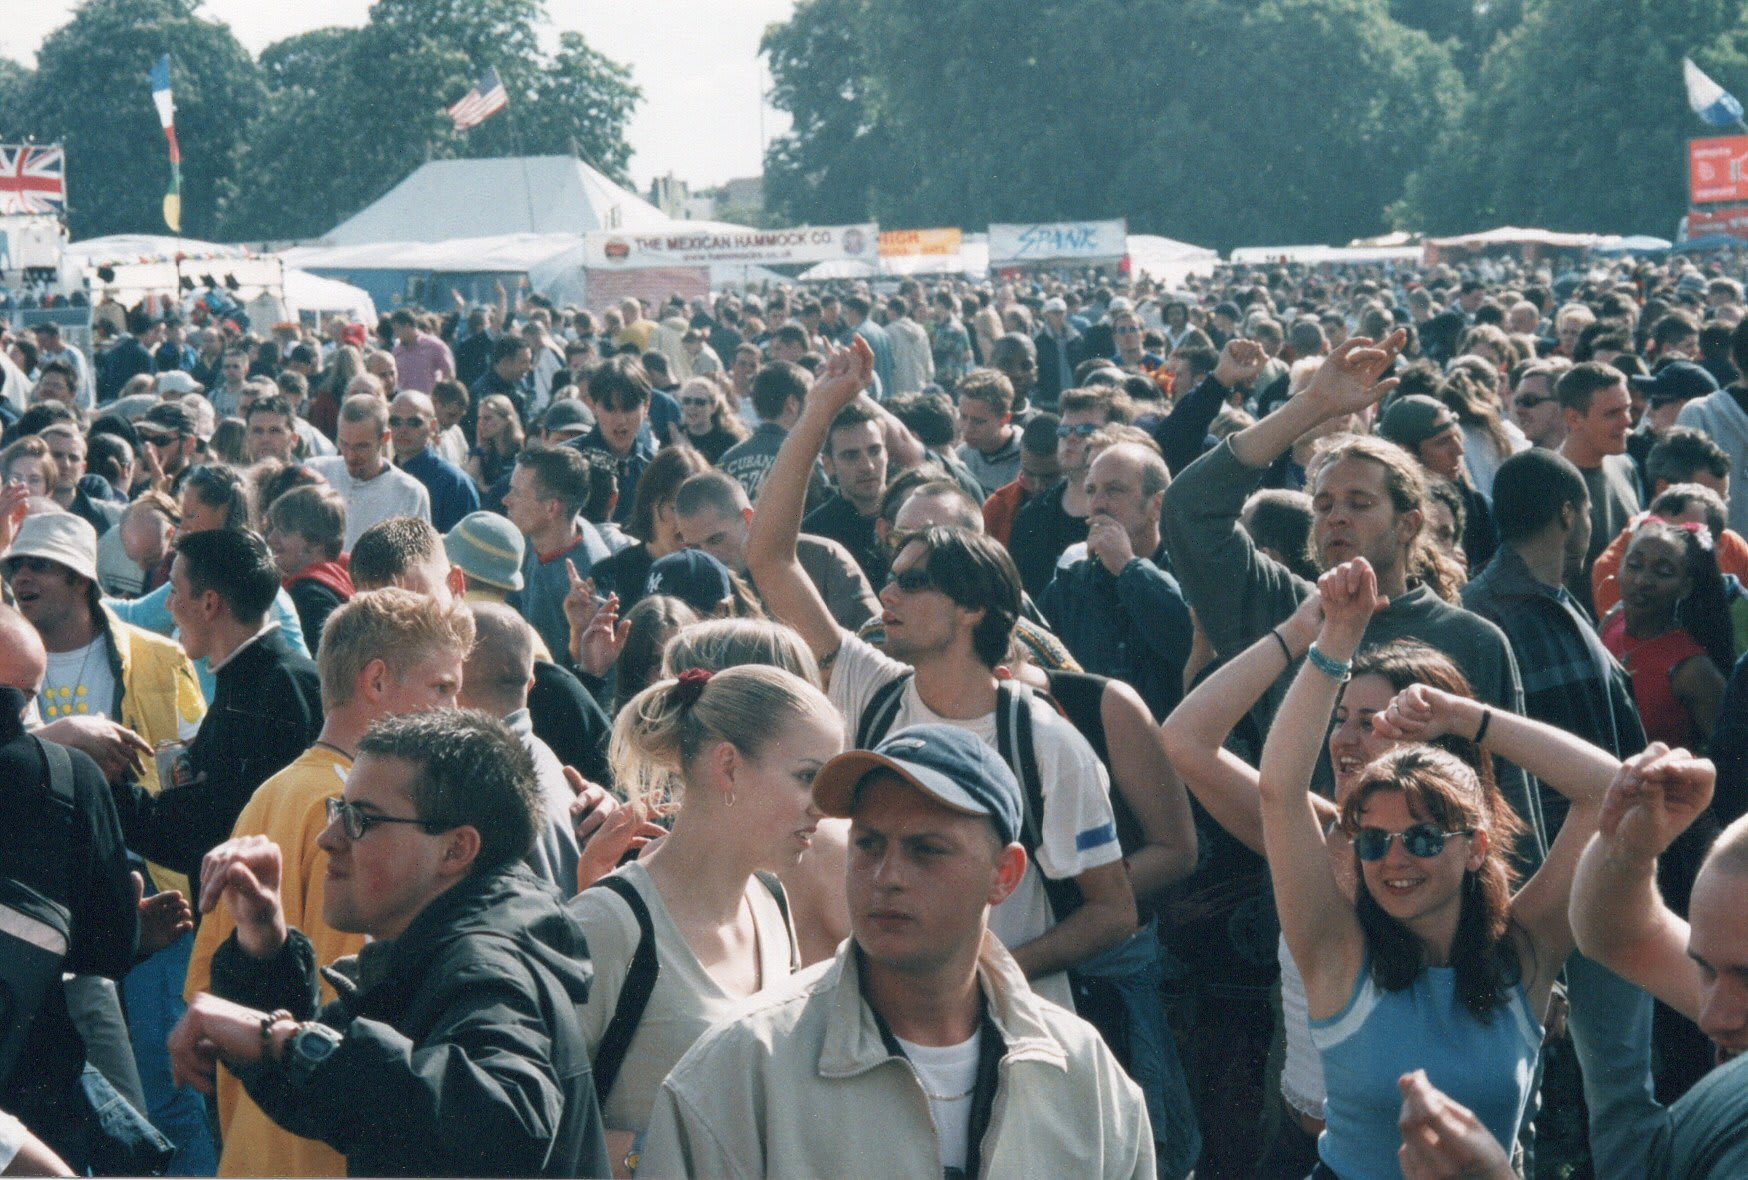 Happy crowds